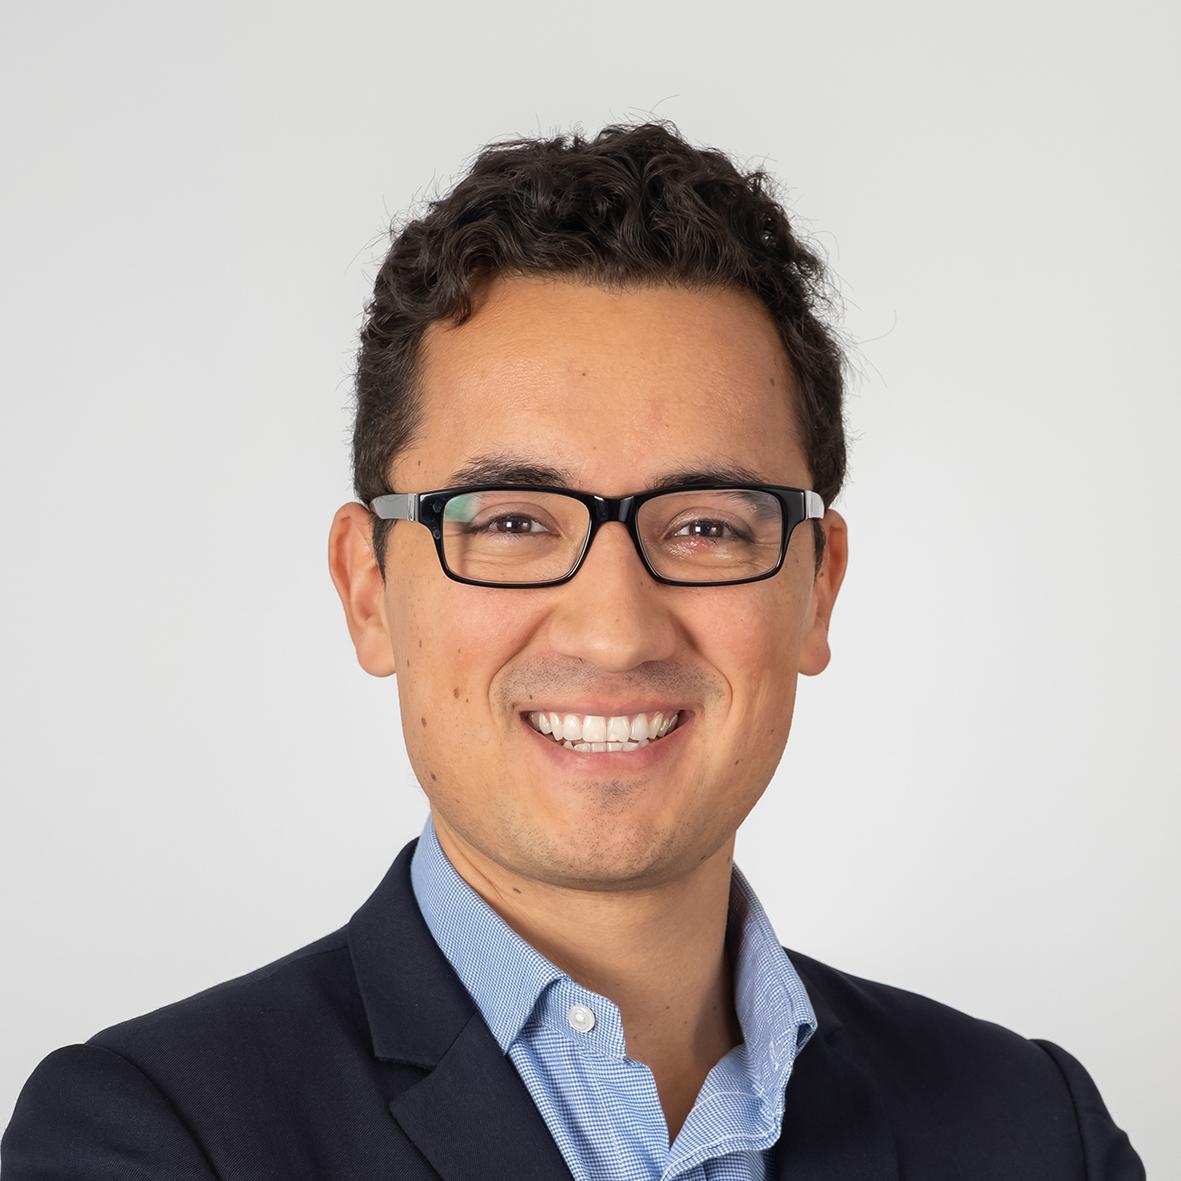 Diego Aponte Vargas, Swen Capital Partners